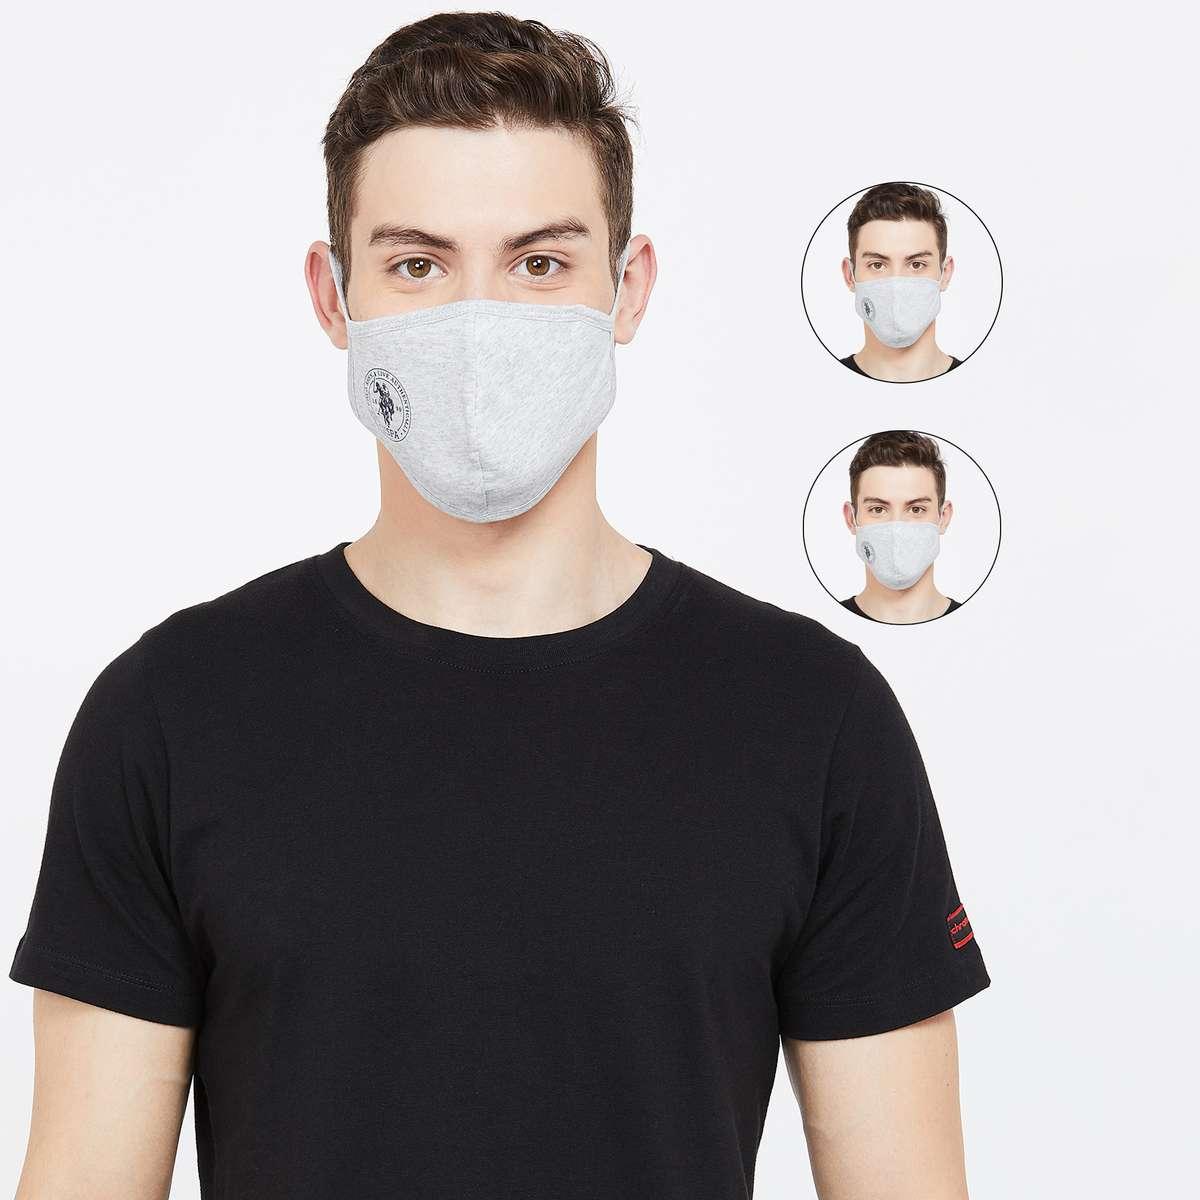 3.U.S. POLO ASSN. Men Textured 3-Layered Reusable Face Masks - Pack of 3